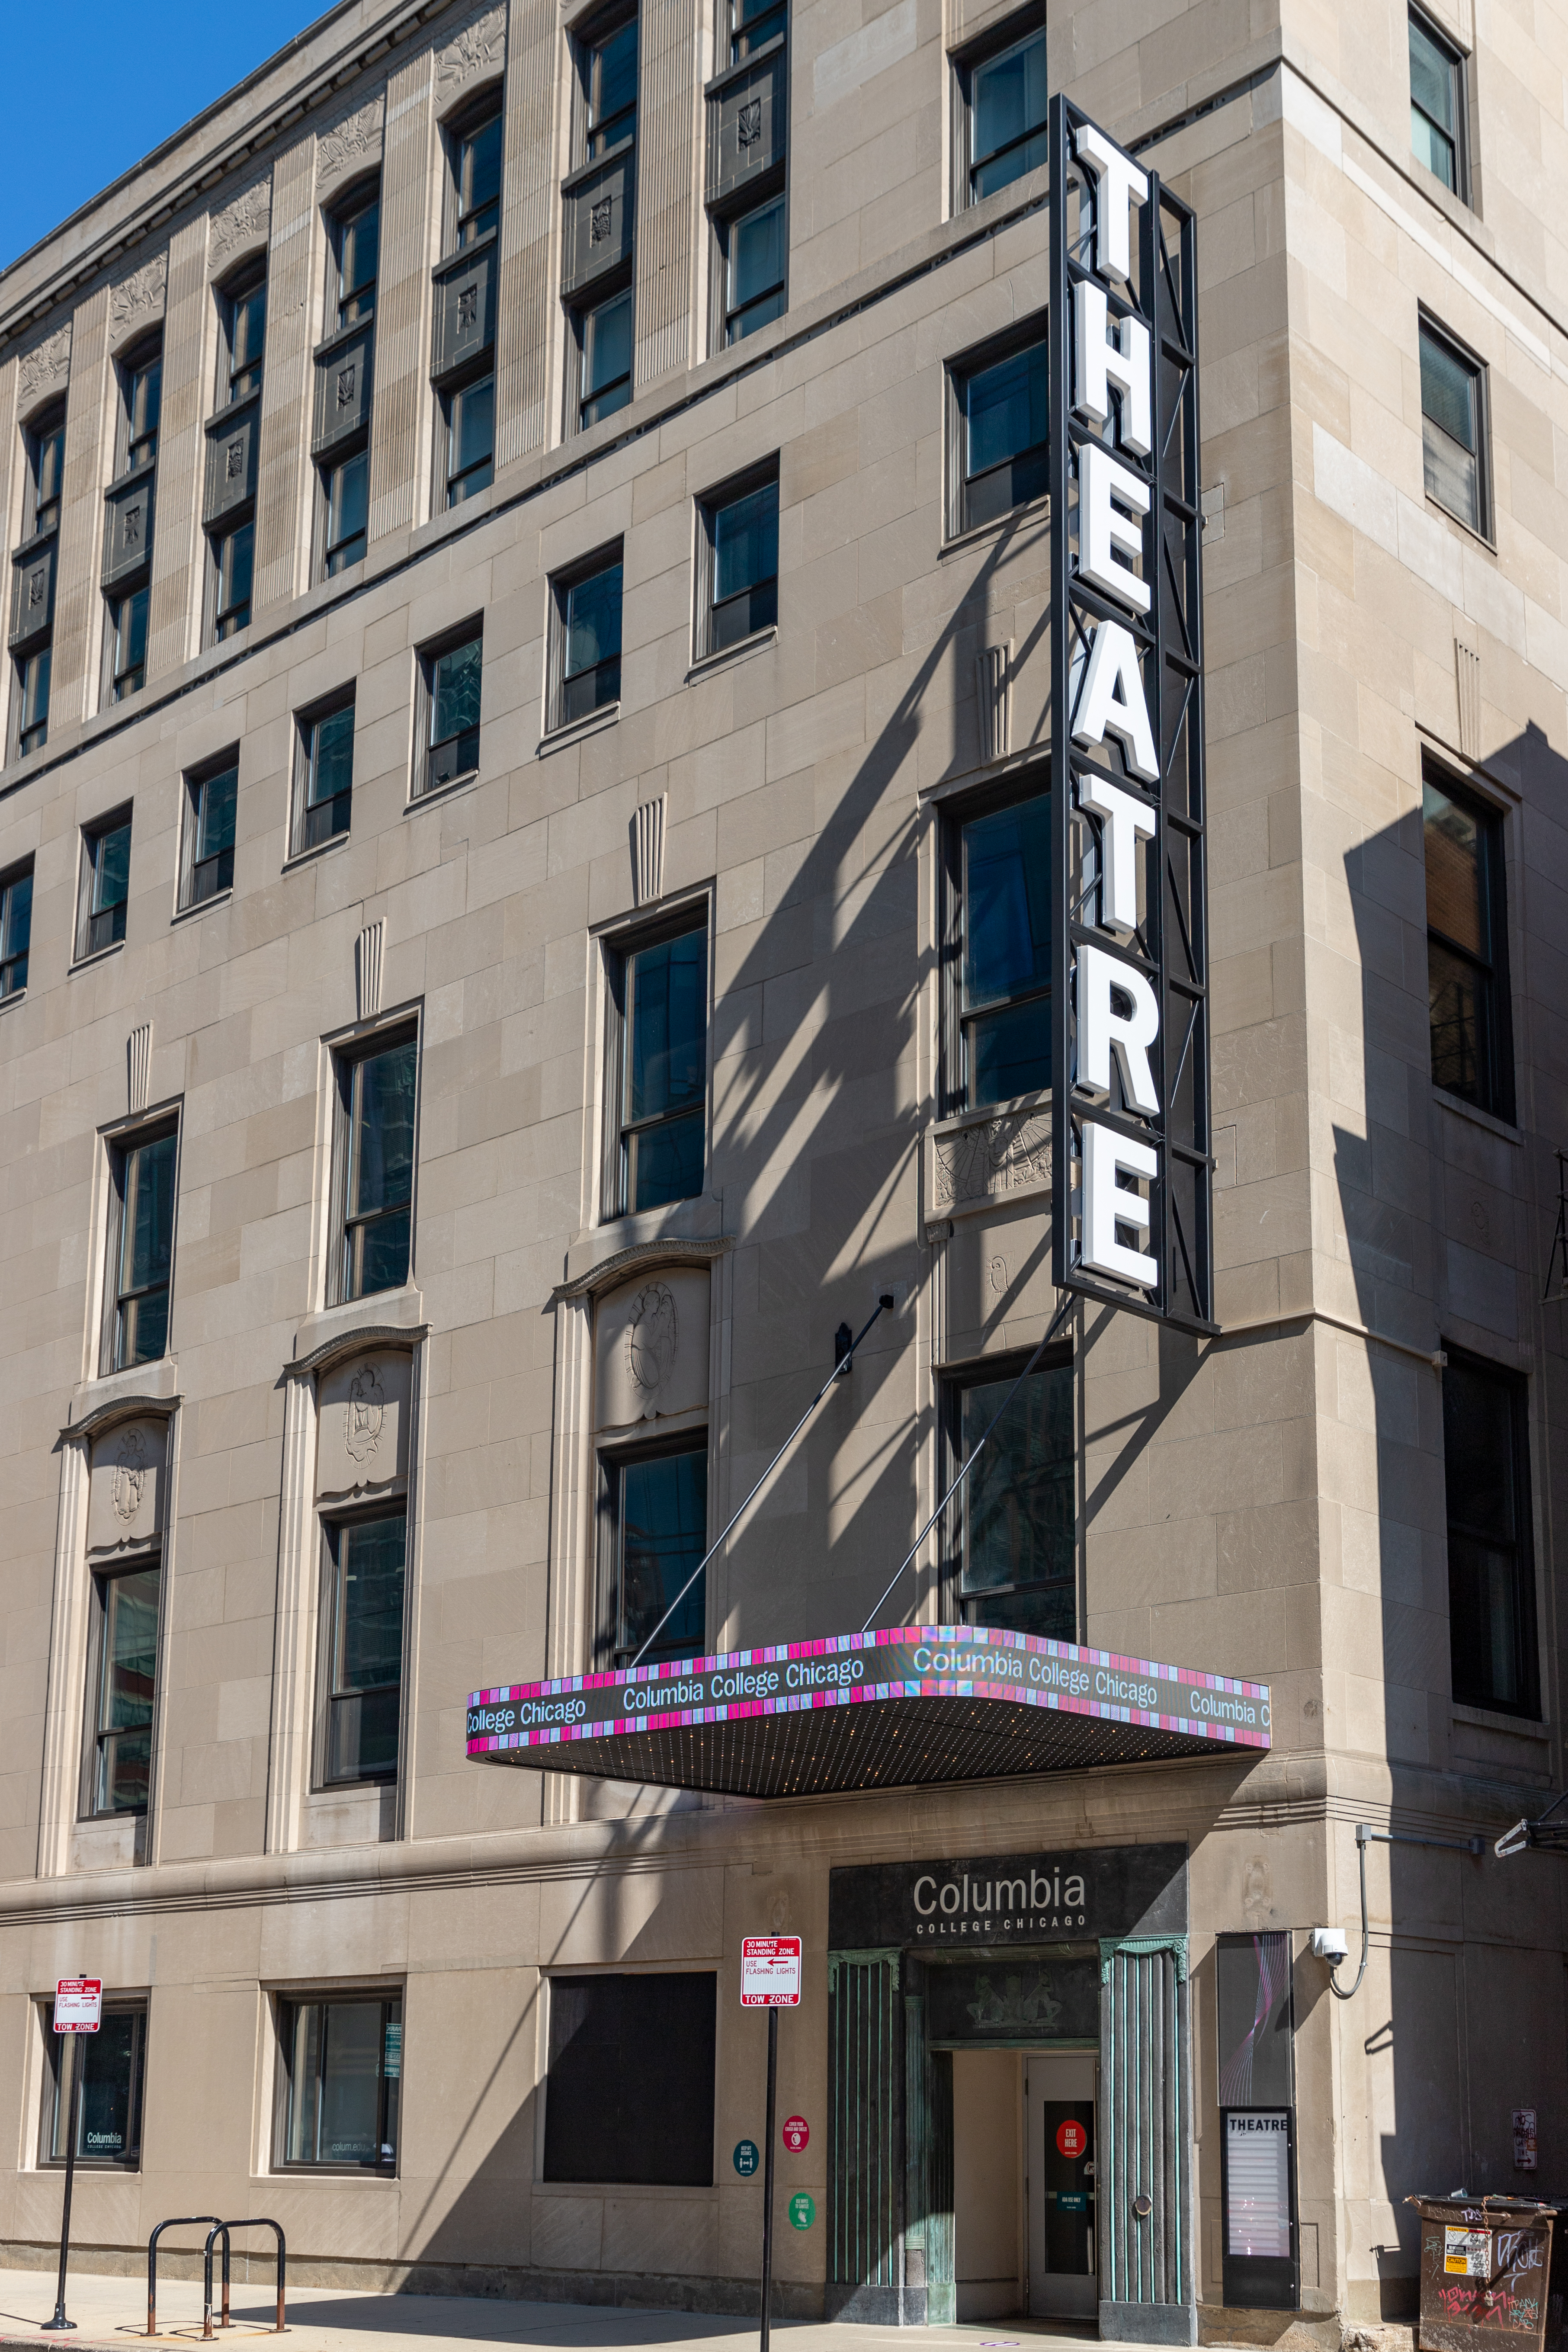 File:Chicago Women's Club Building-Columbia College Chicago Getz Theater Center 2020-0428.jpg